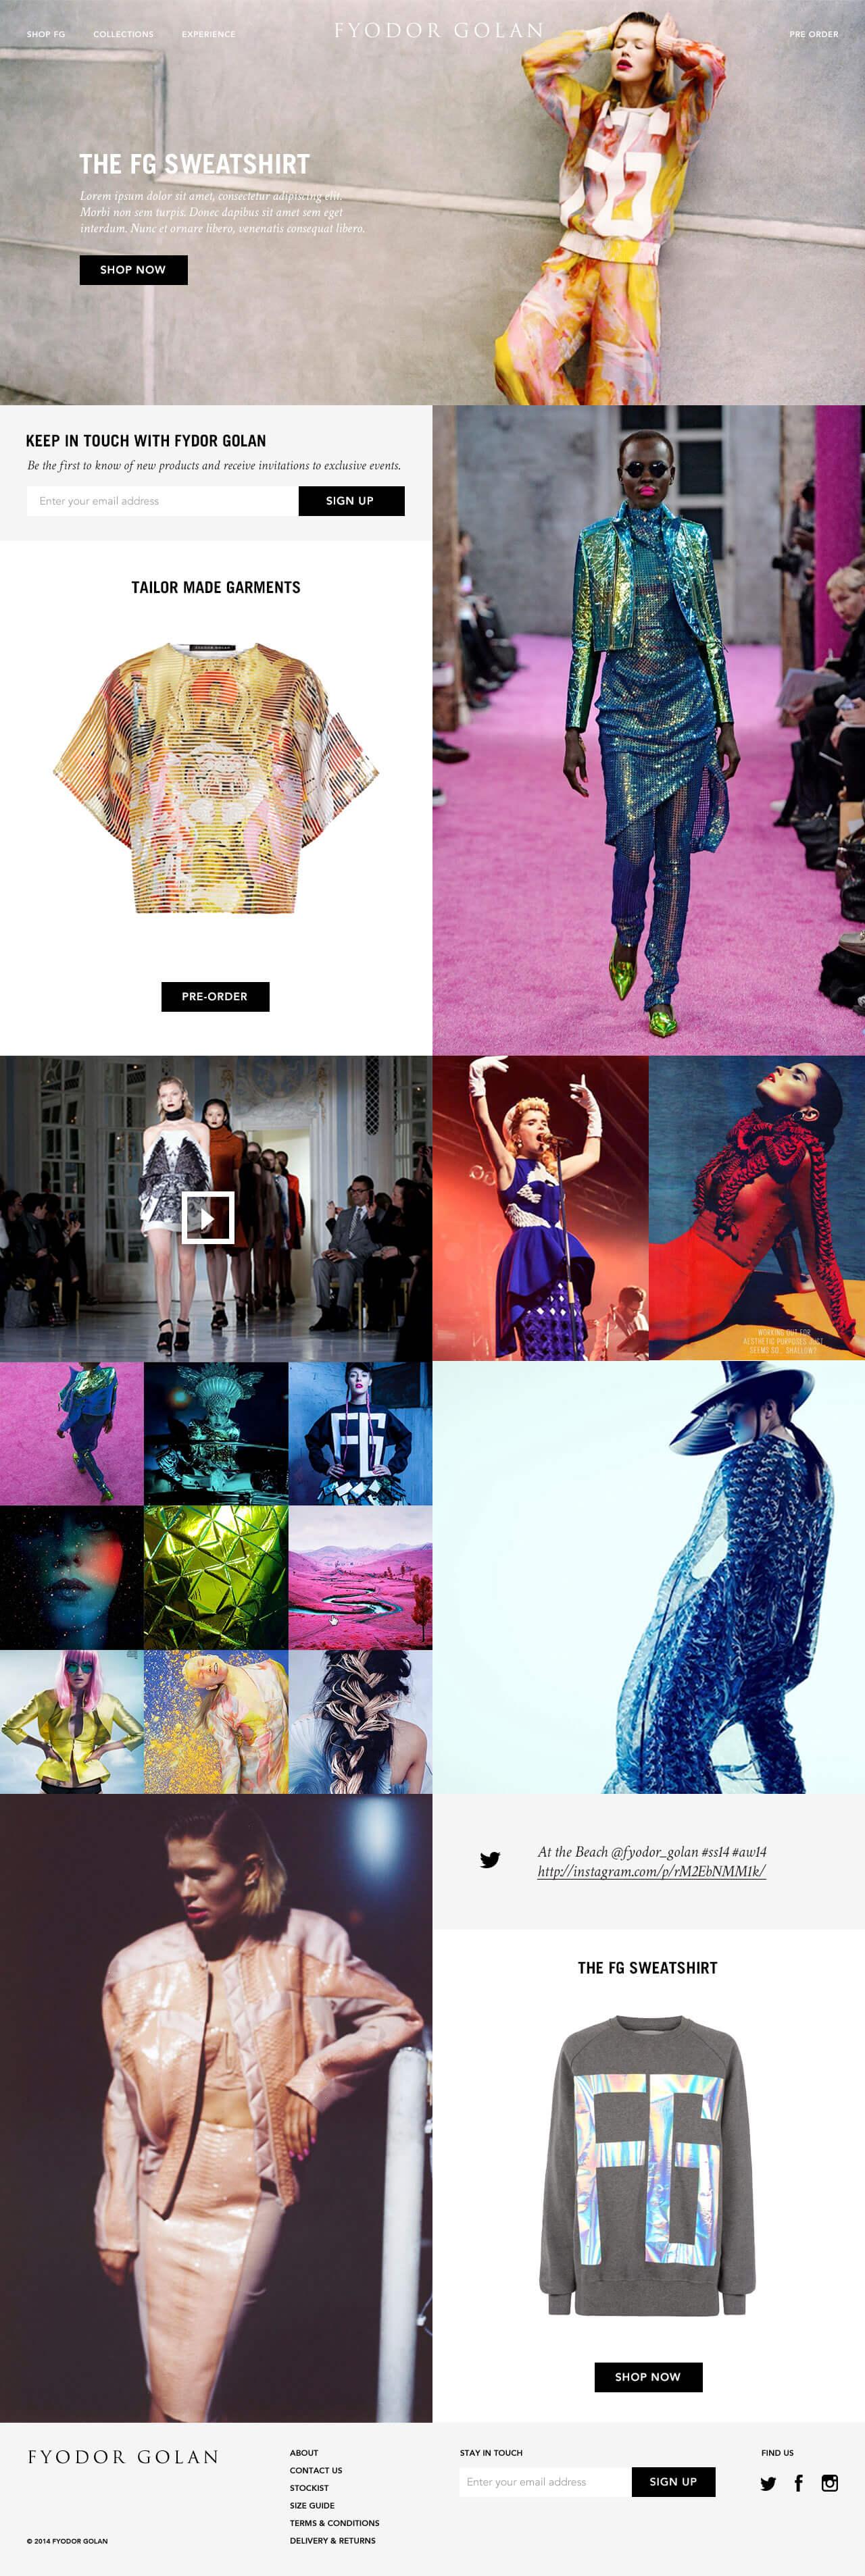 01_fyodorgolan_homepage